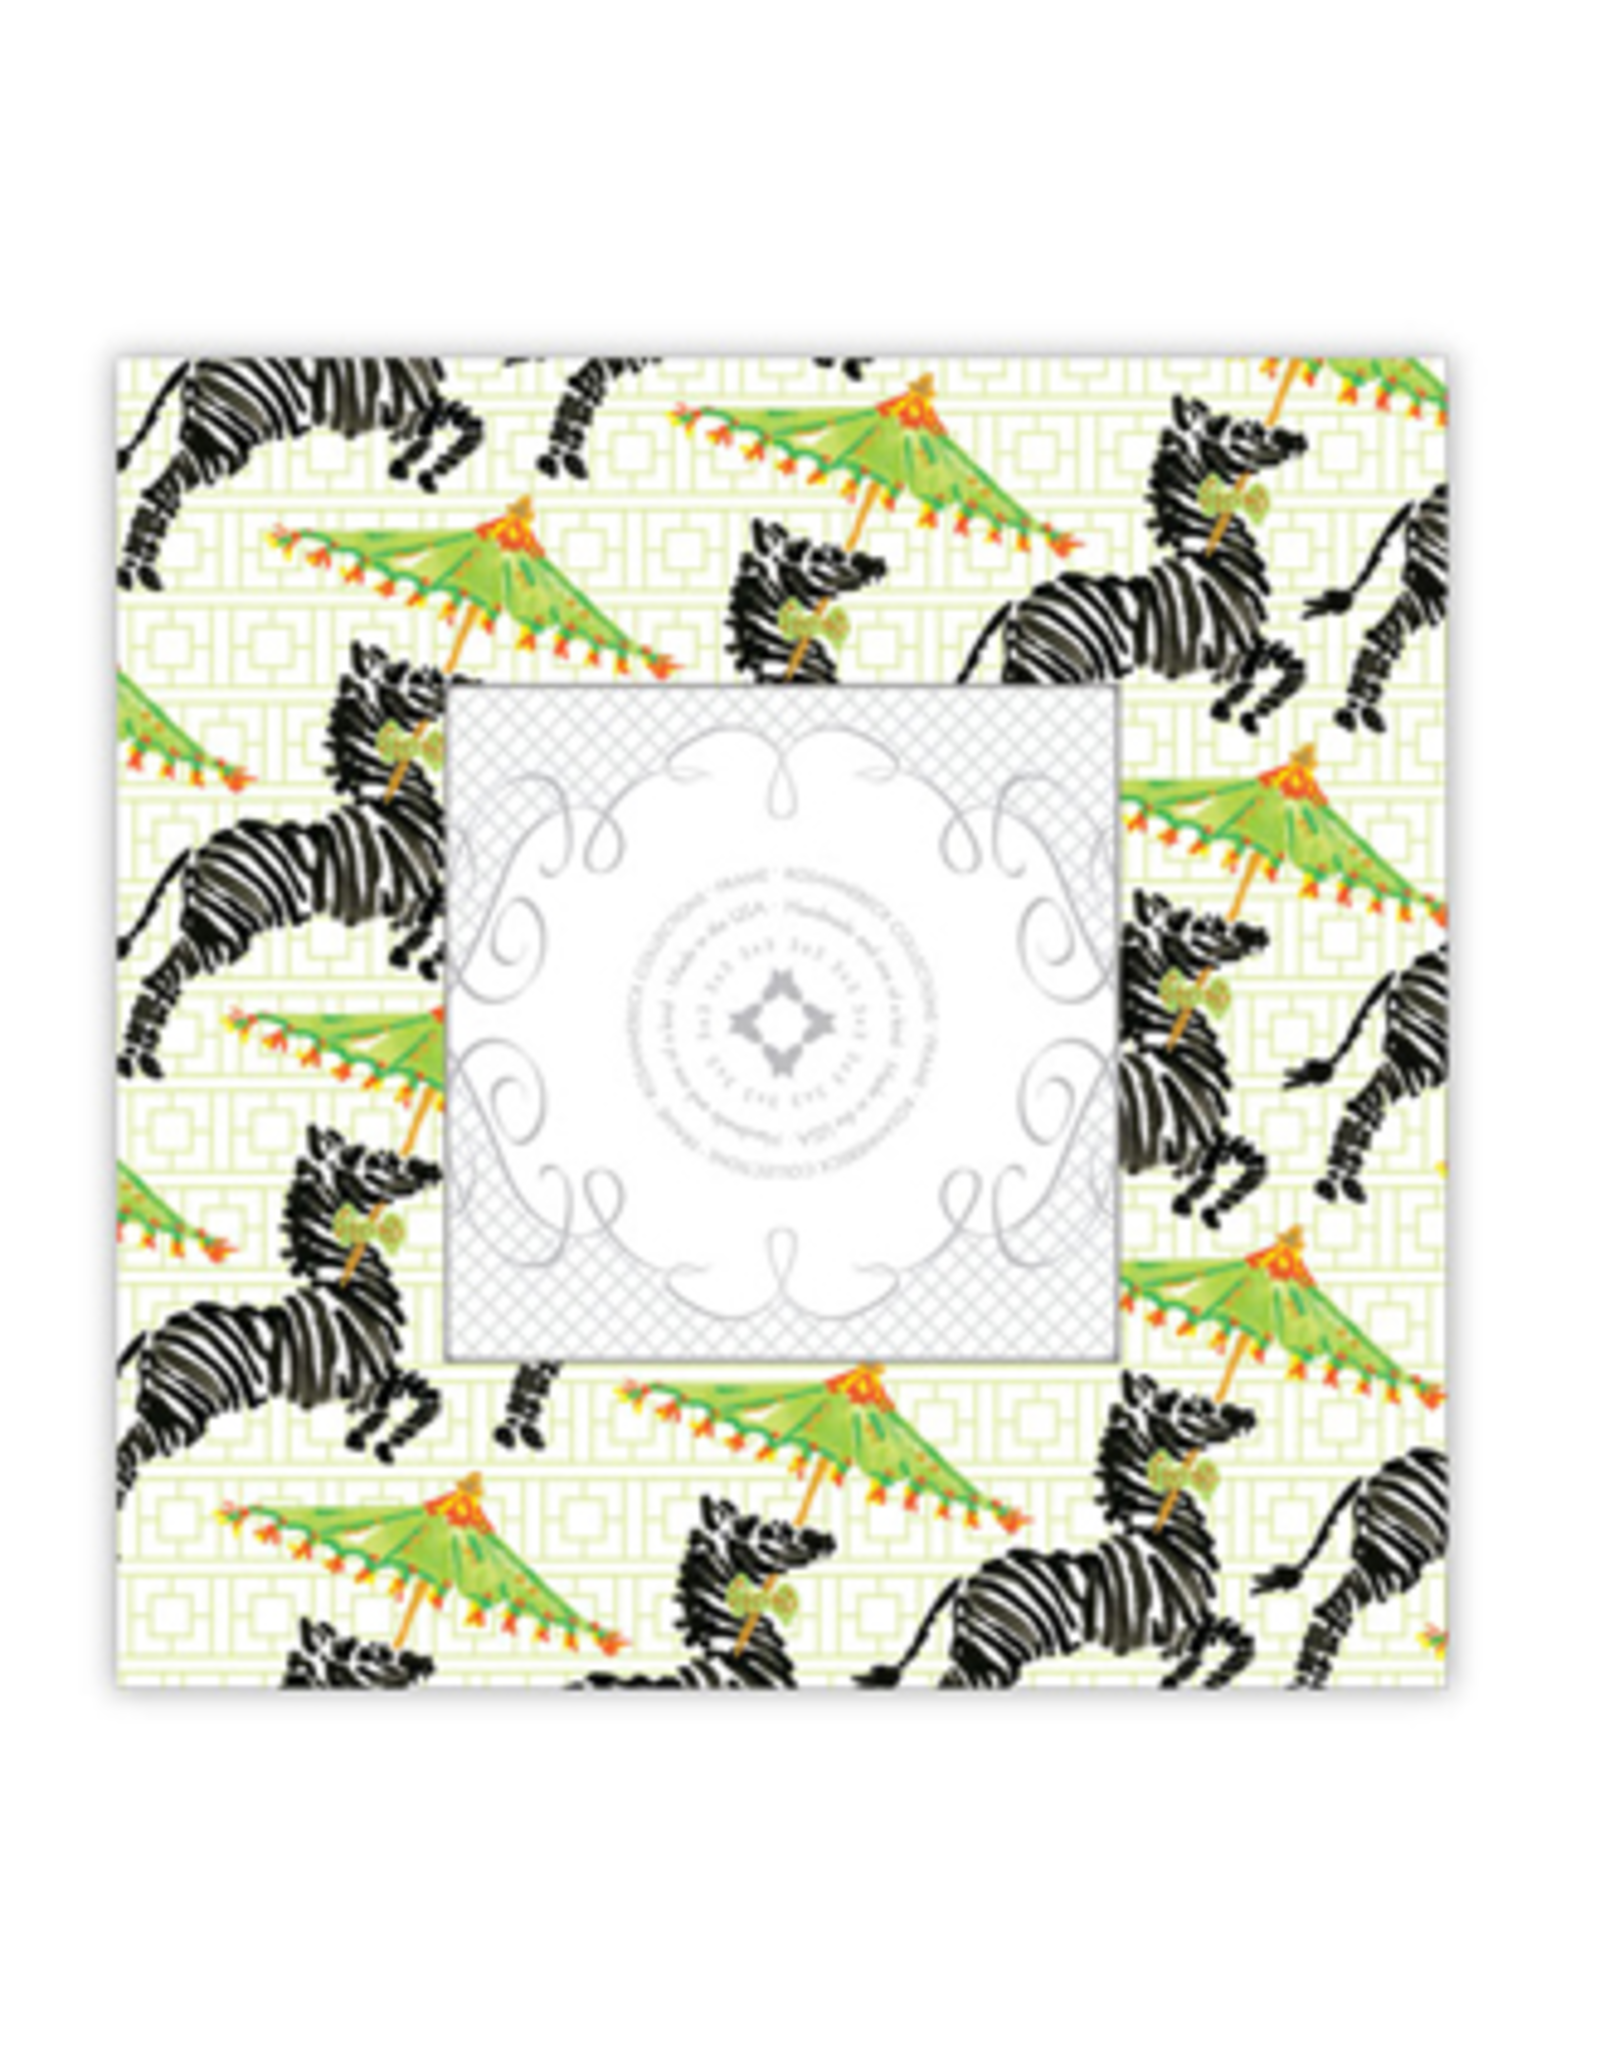 Watercolor Asian Zebra 3x3 Frame